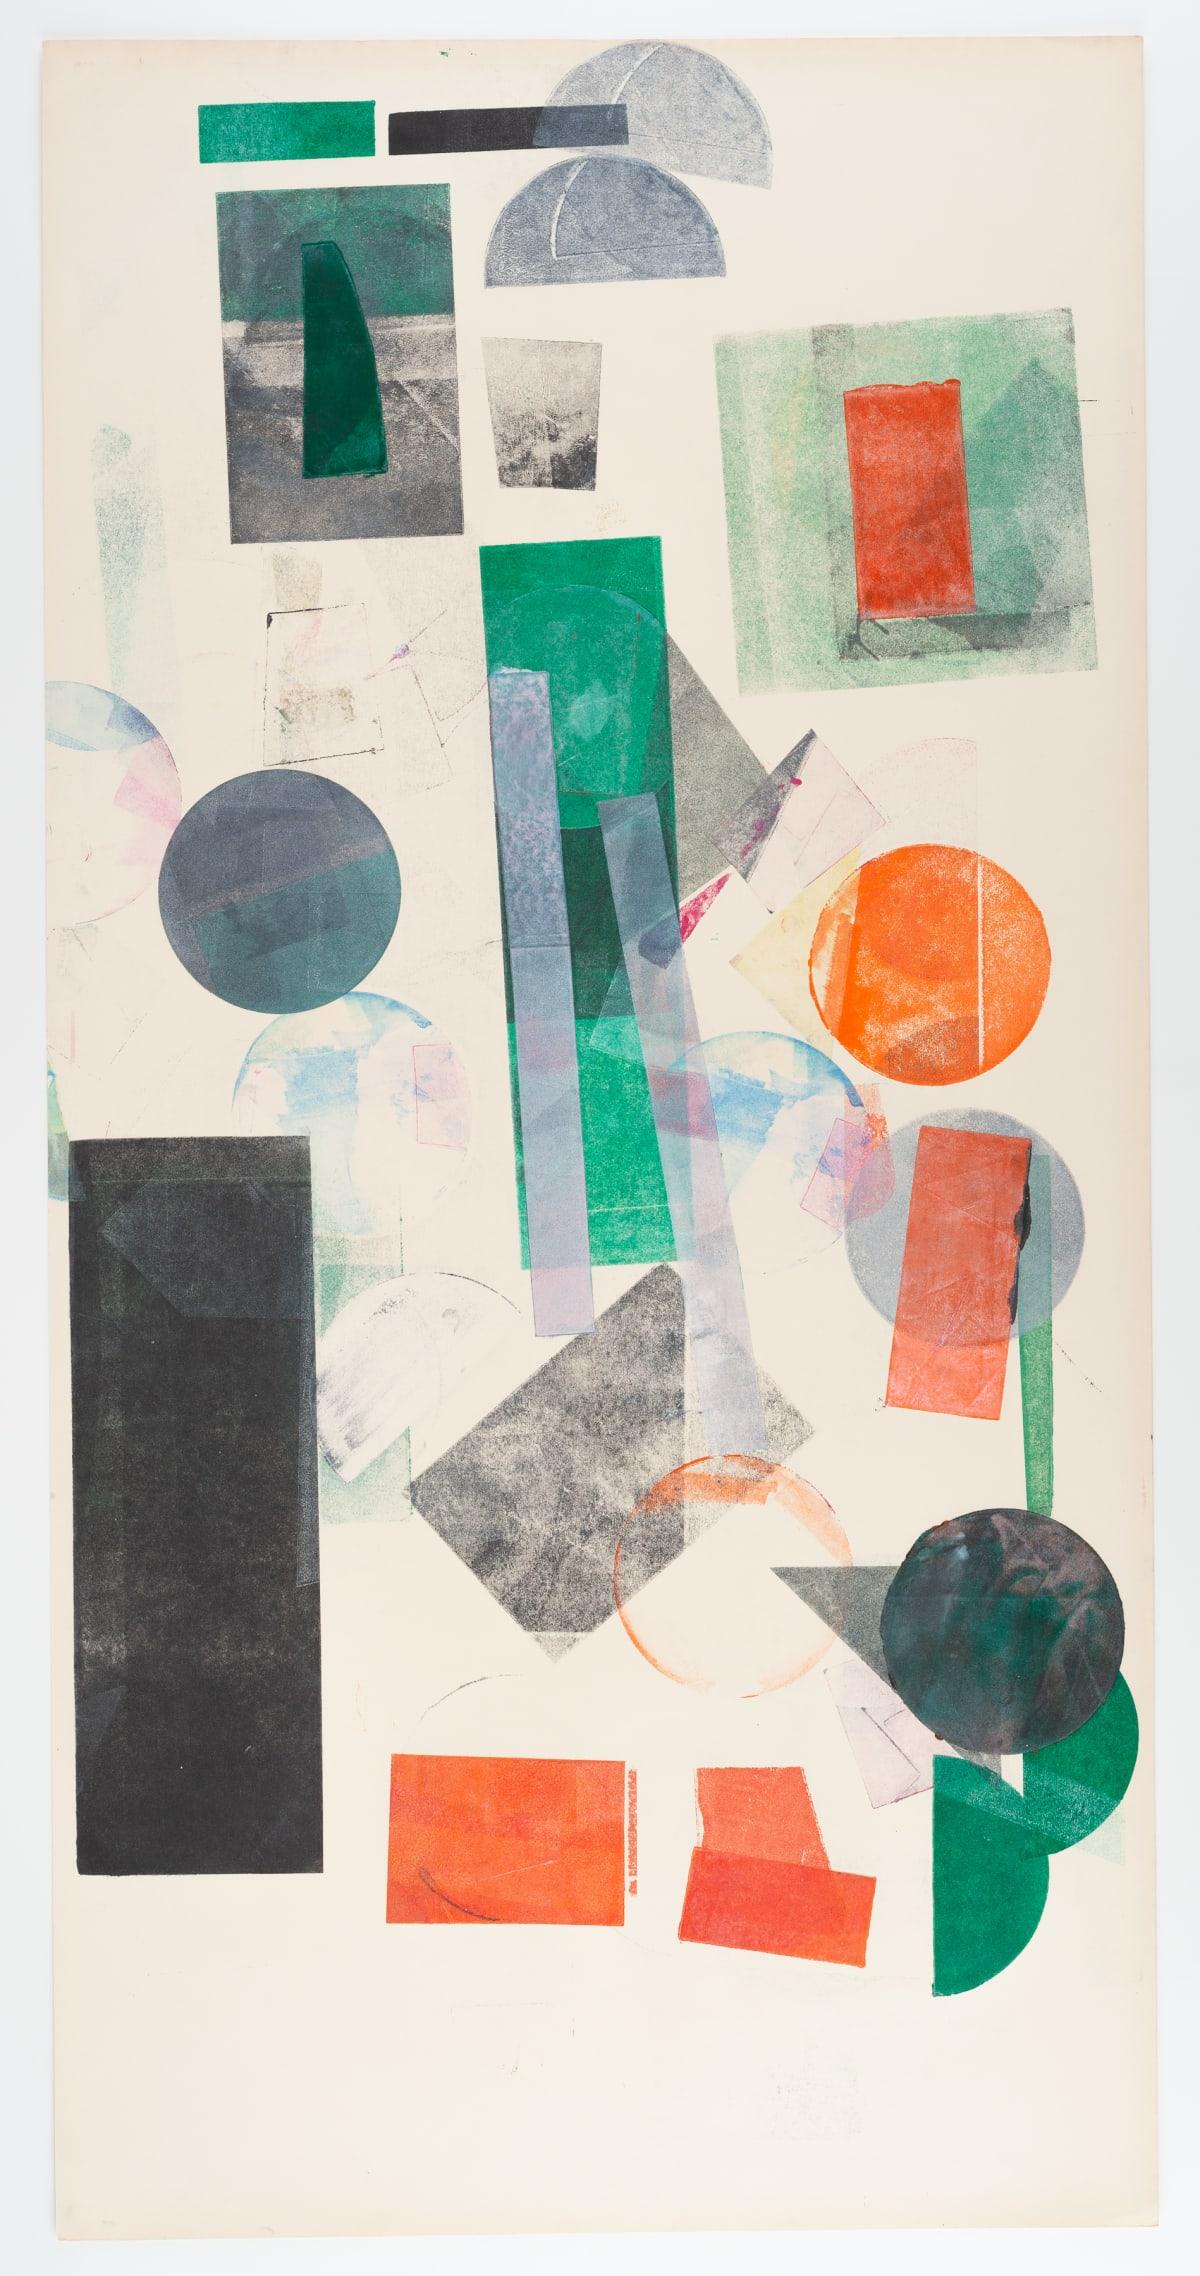 Austin Thomas, Diagrams and Symbols, 2017